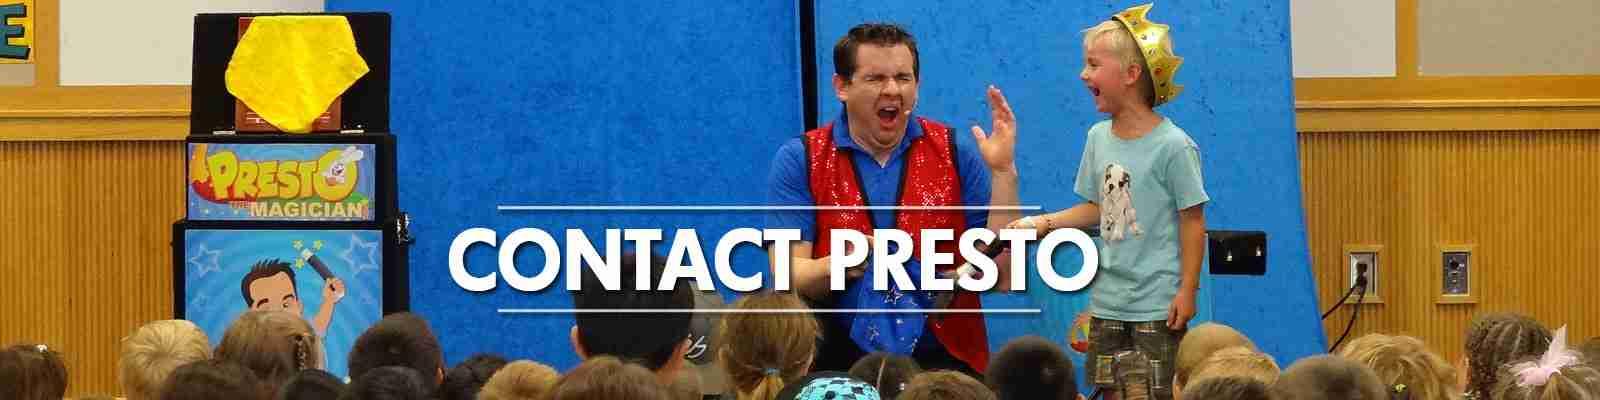 contact presto the magician